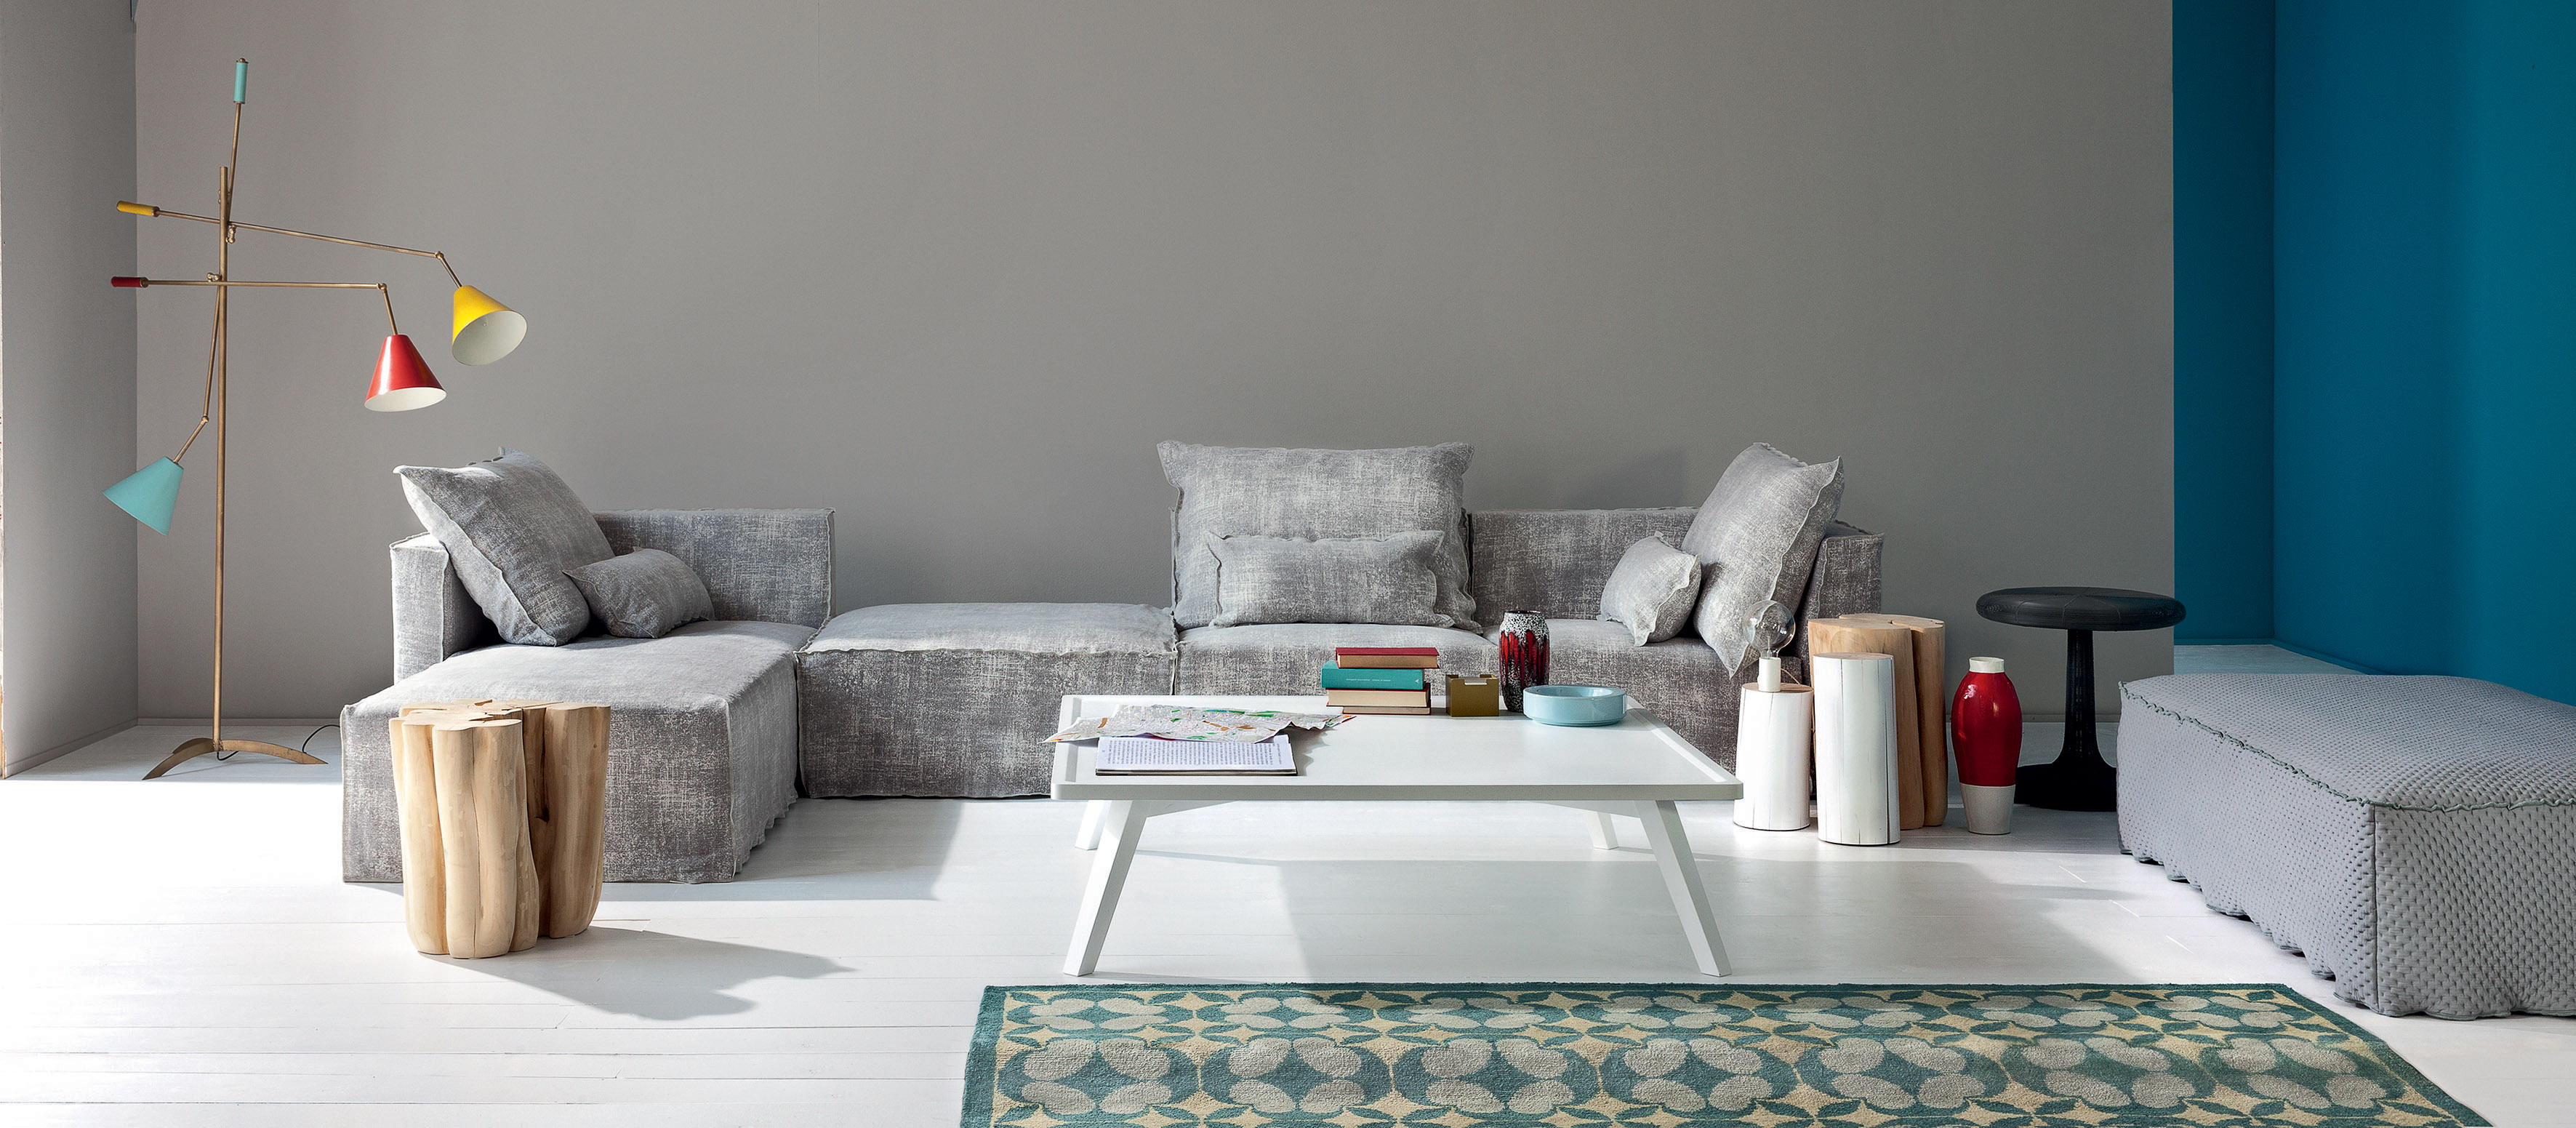 design das die fantasie anregt sweet home. Black Bedroom Furniture Sets. Home Design Ideas